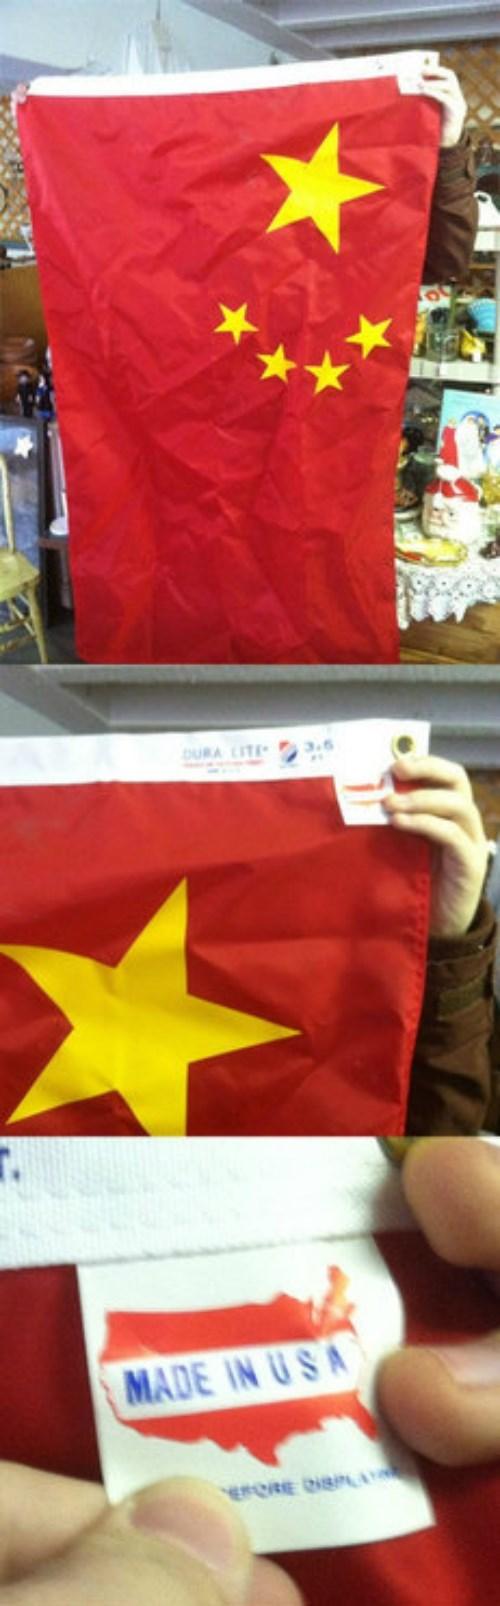 China made in usa - 8438462464